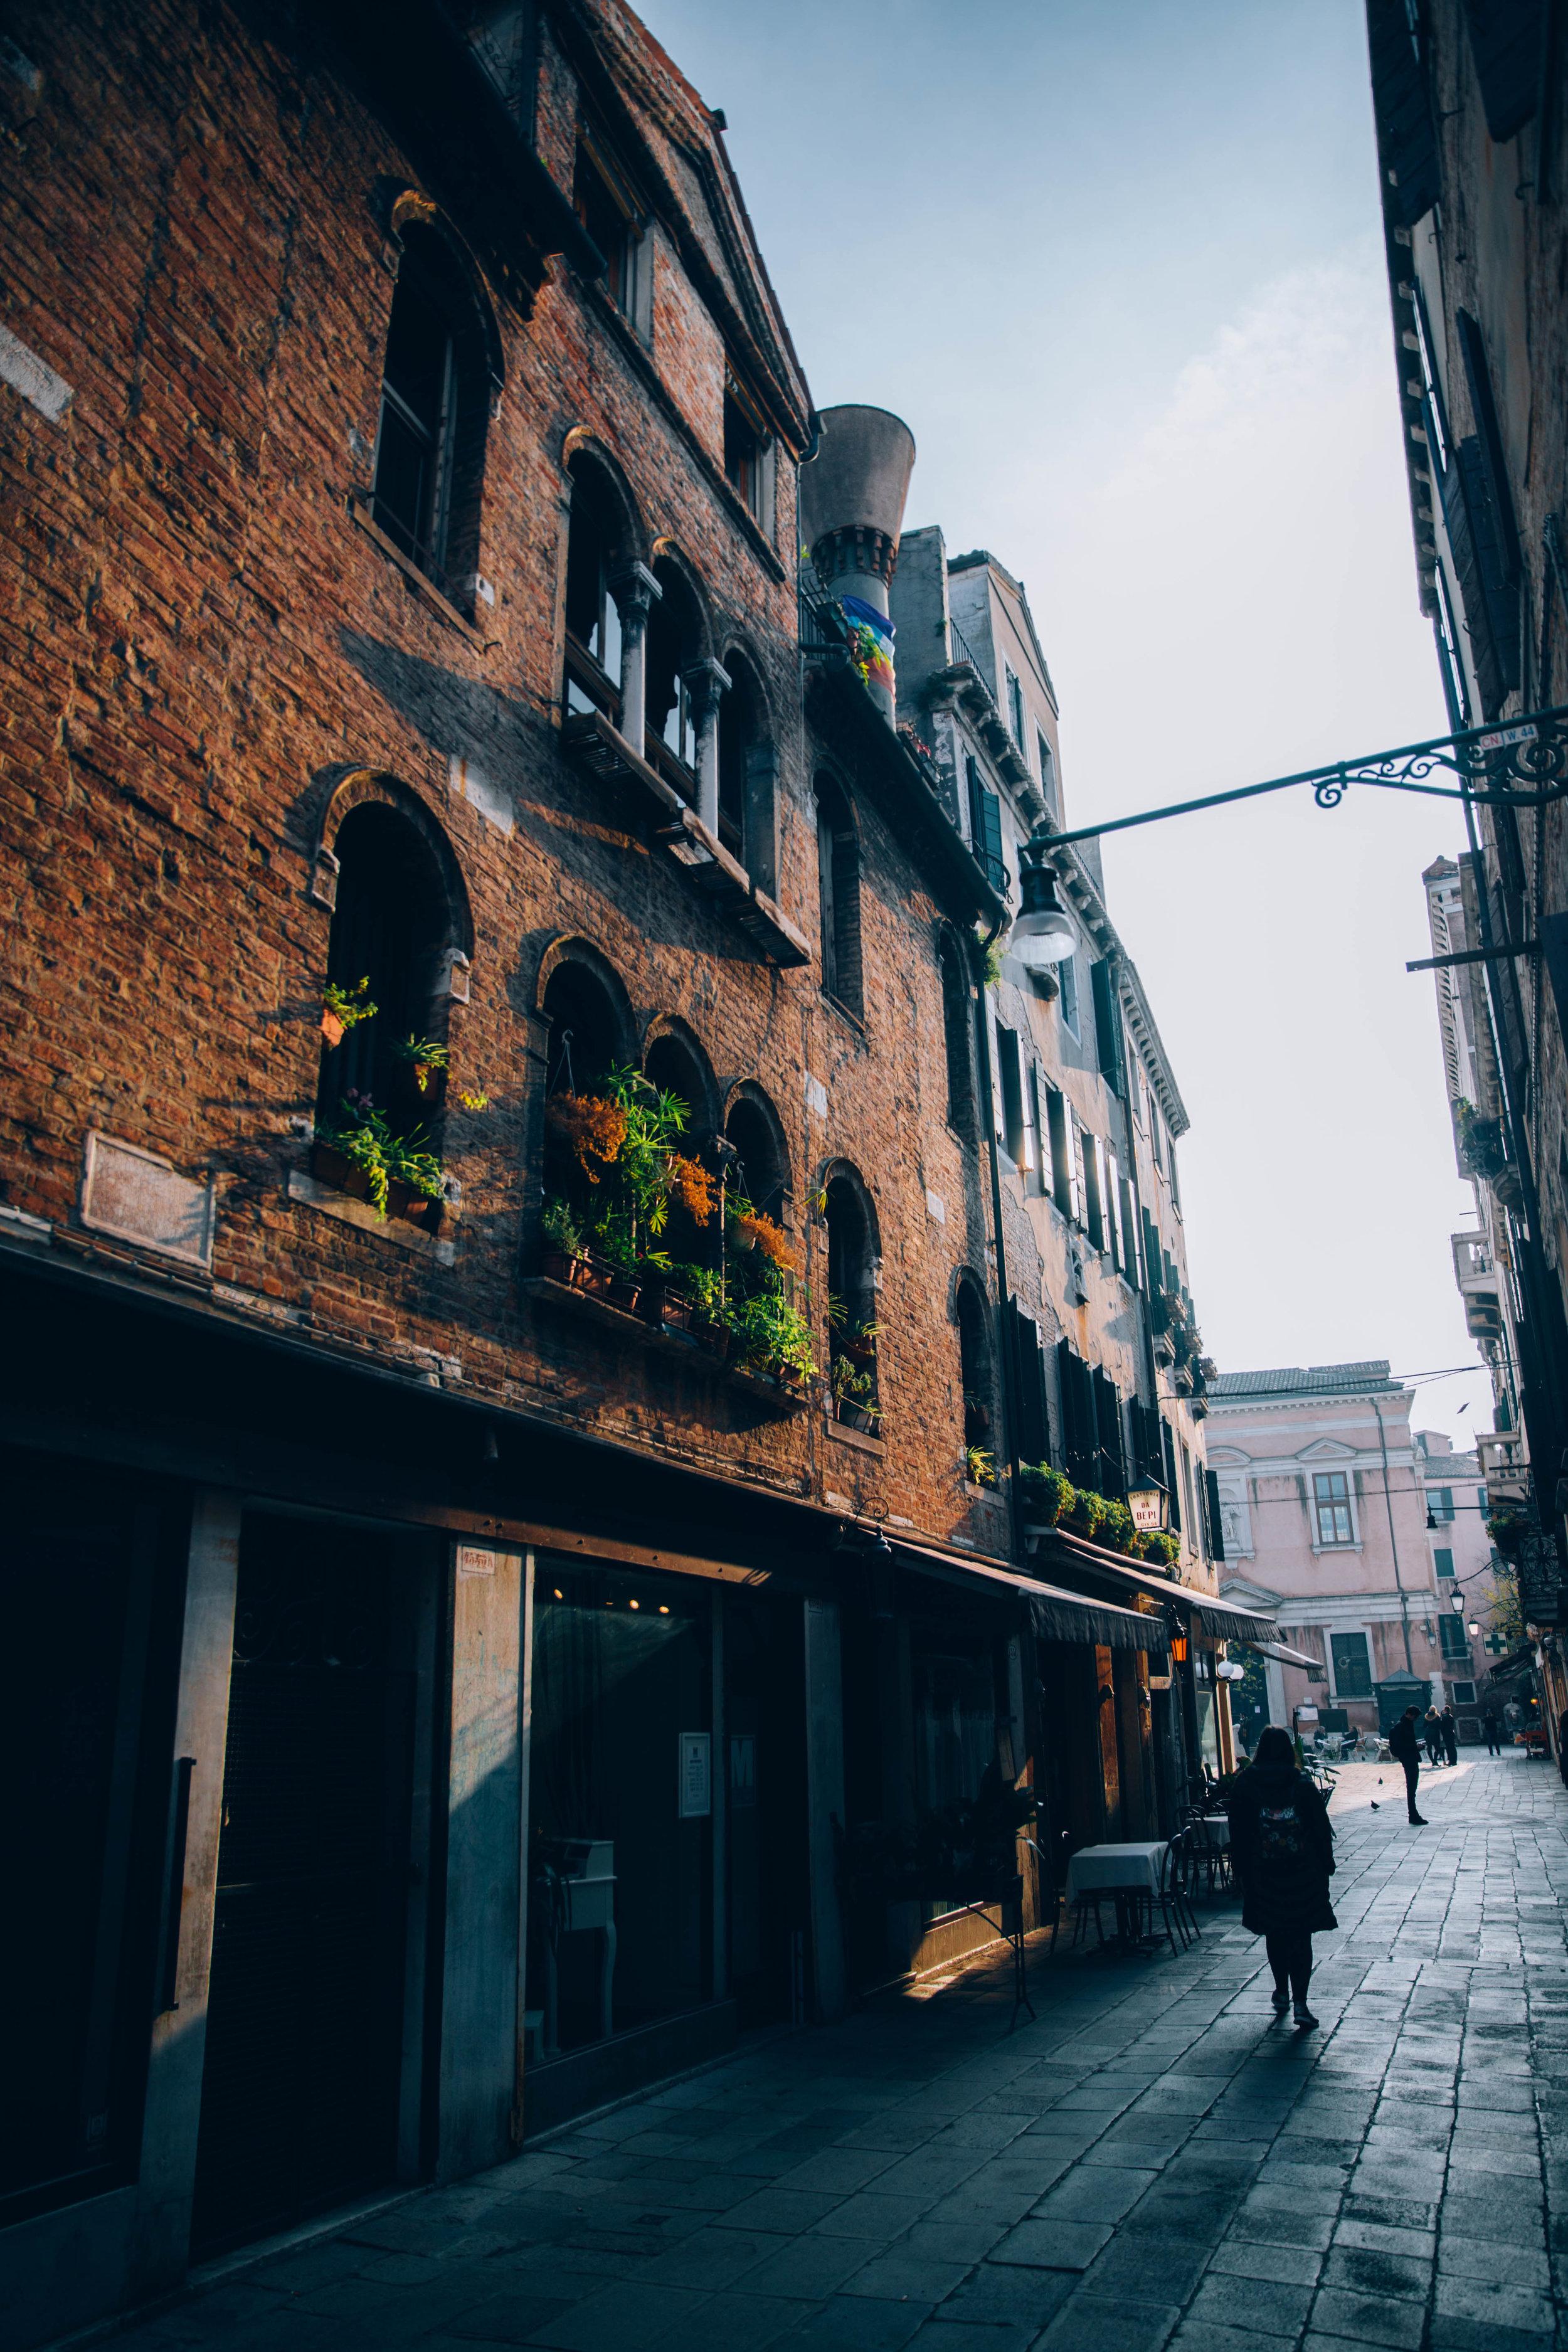 Venice-429.jpg